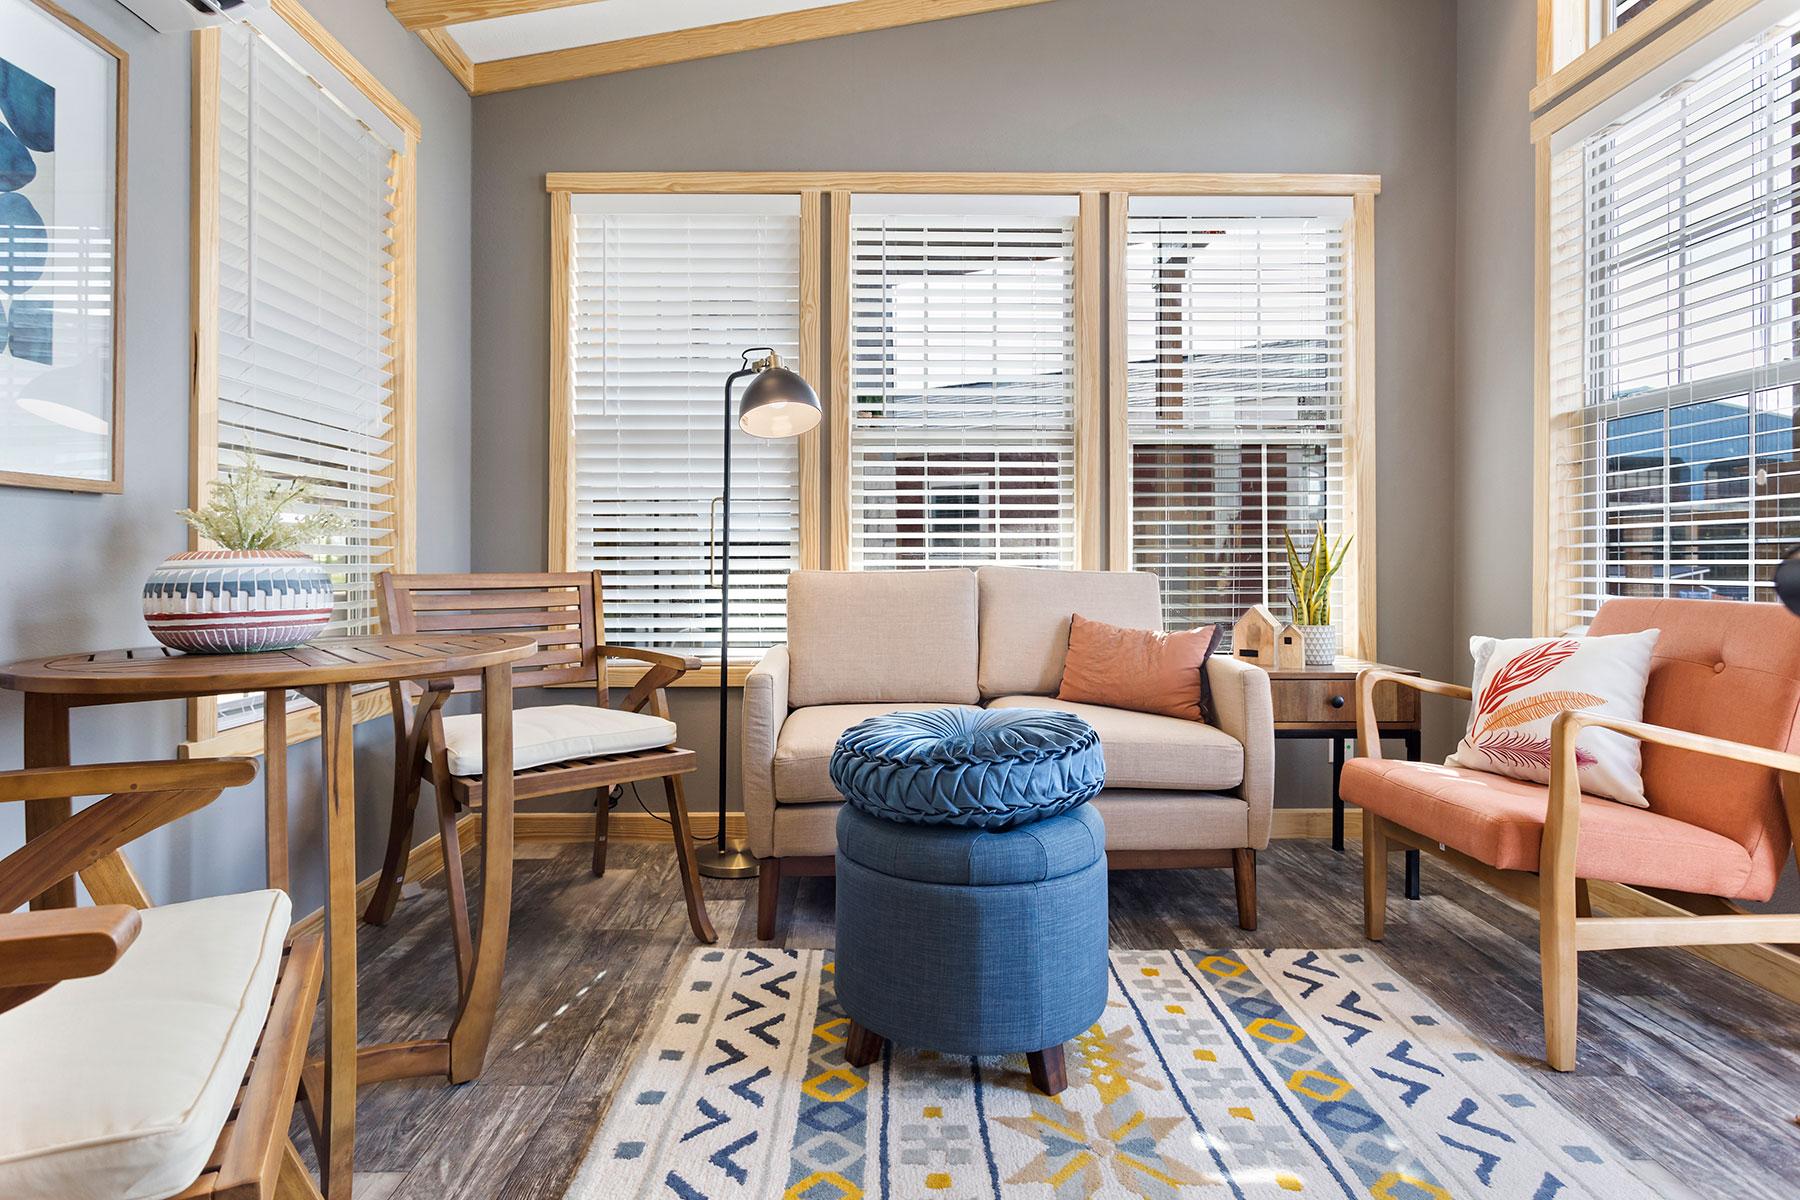 520-living-room-1